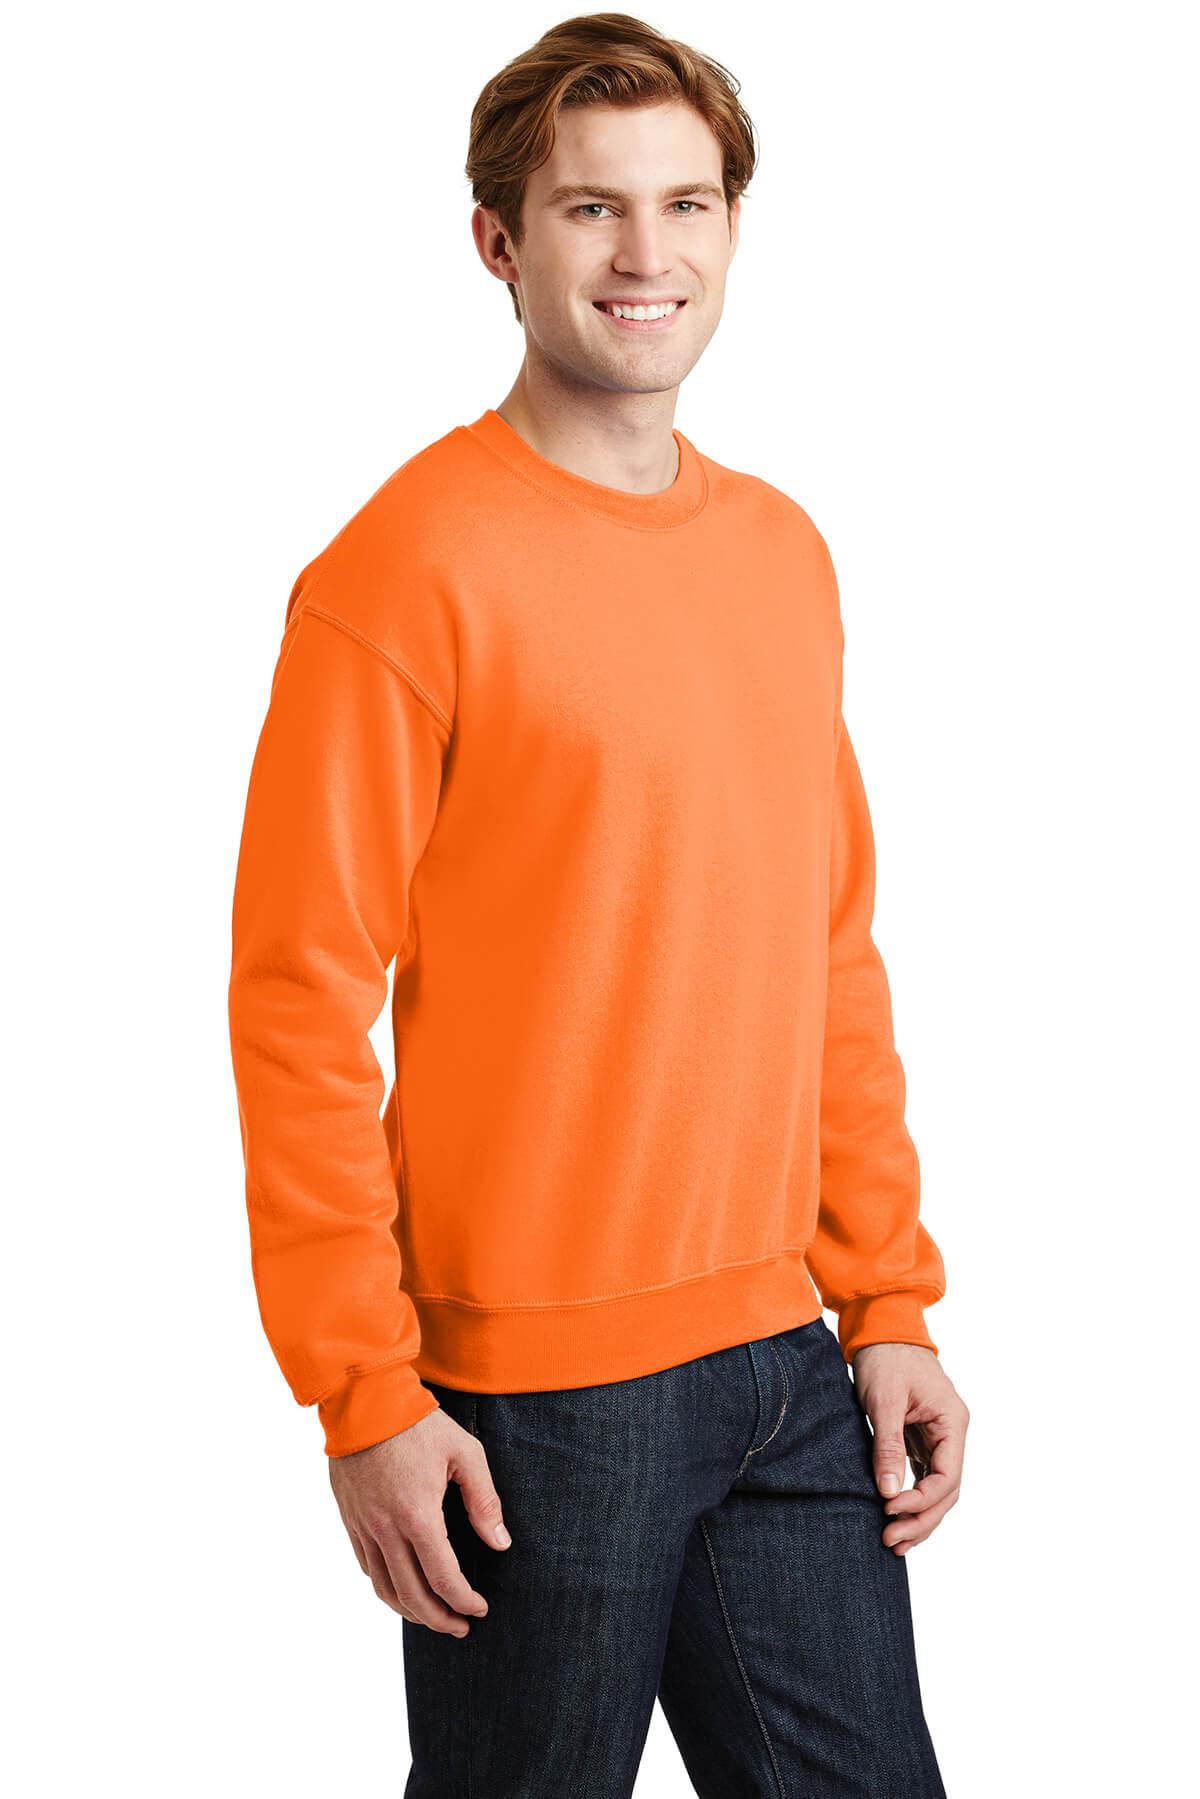 18000-southern-orange-4